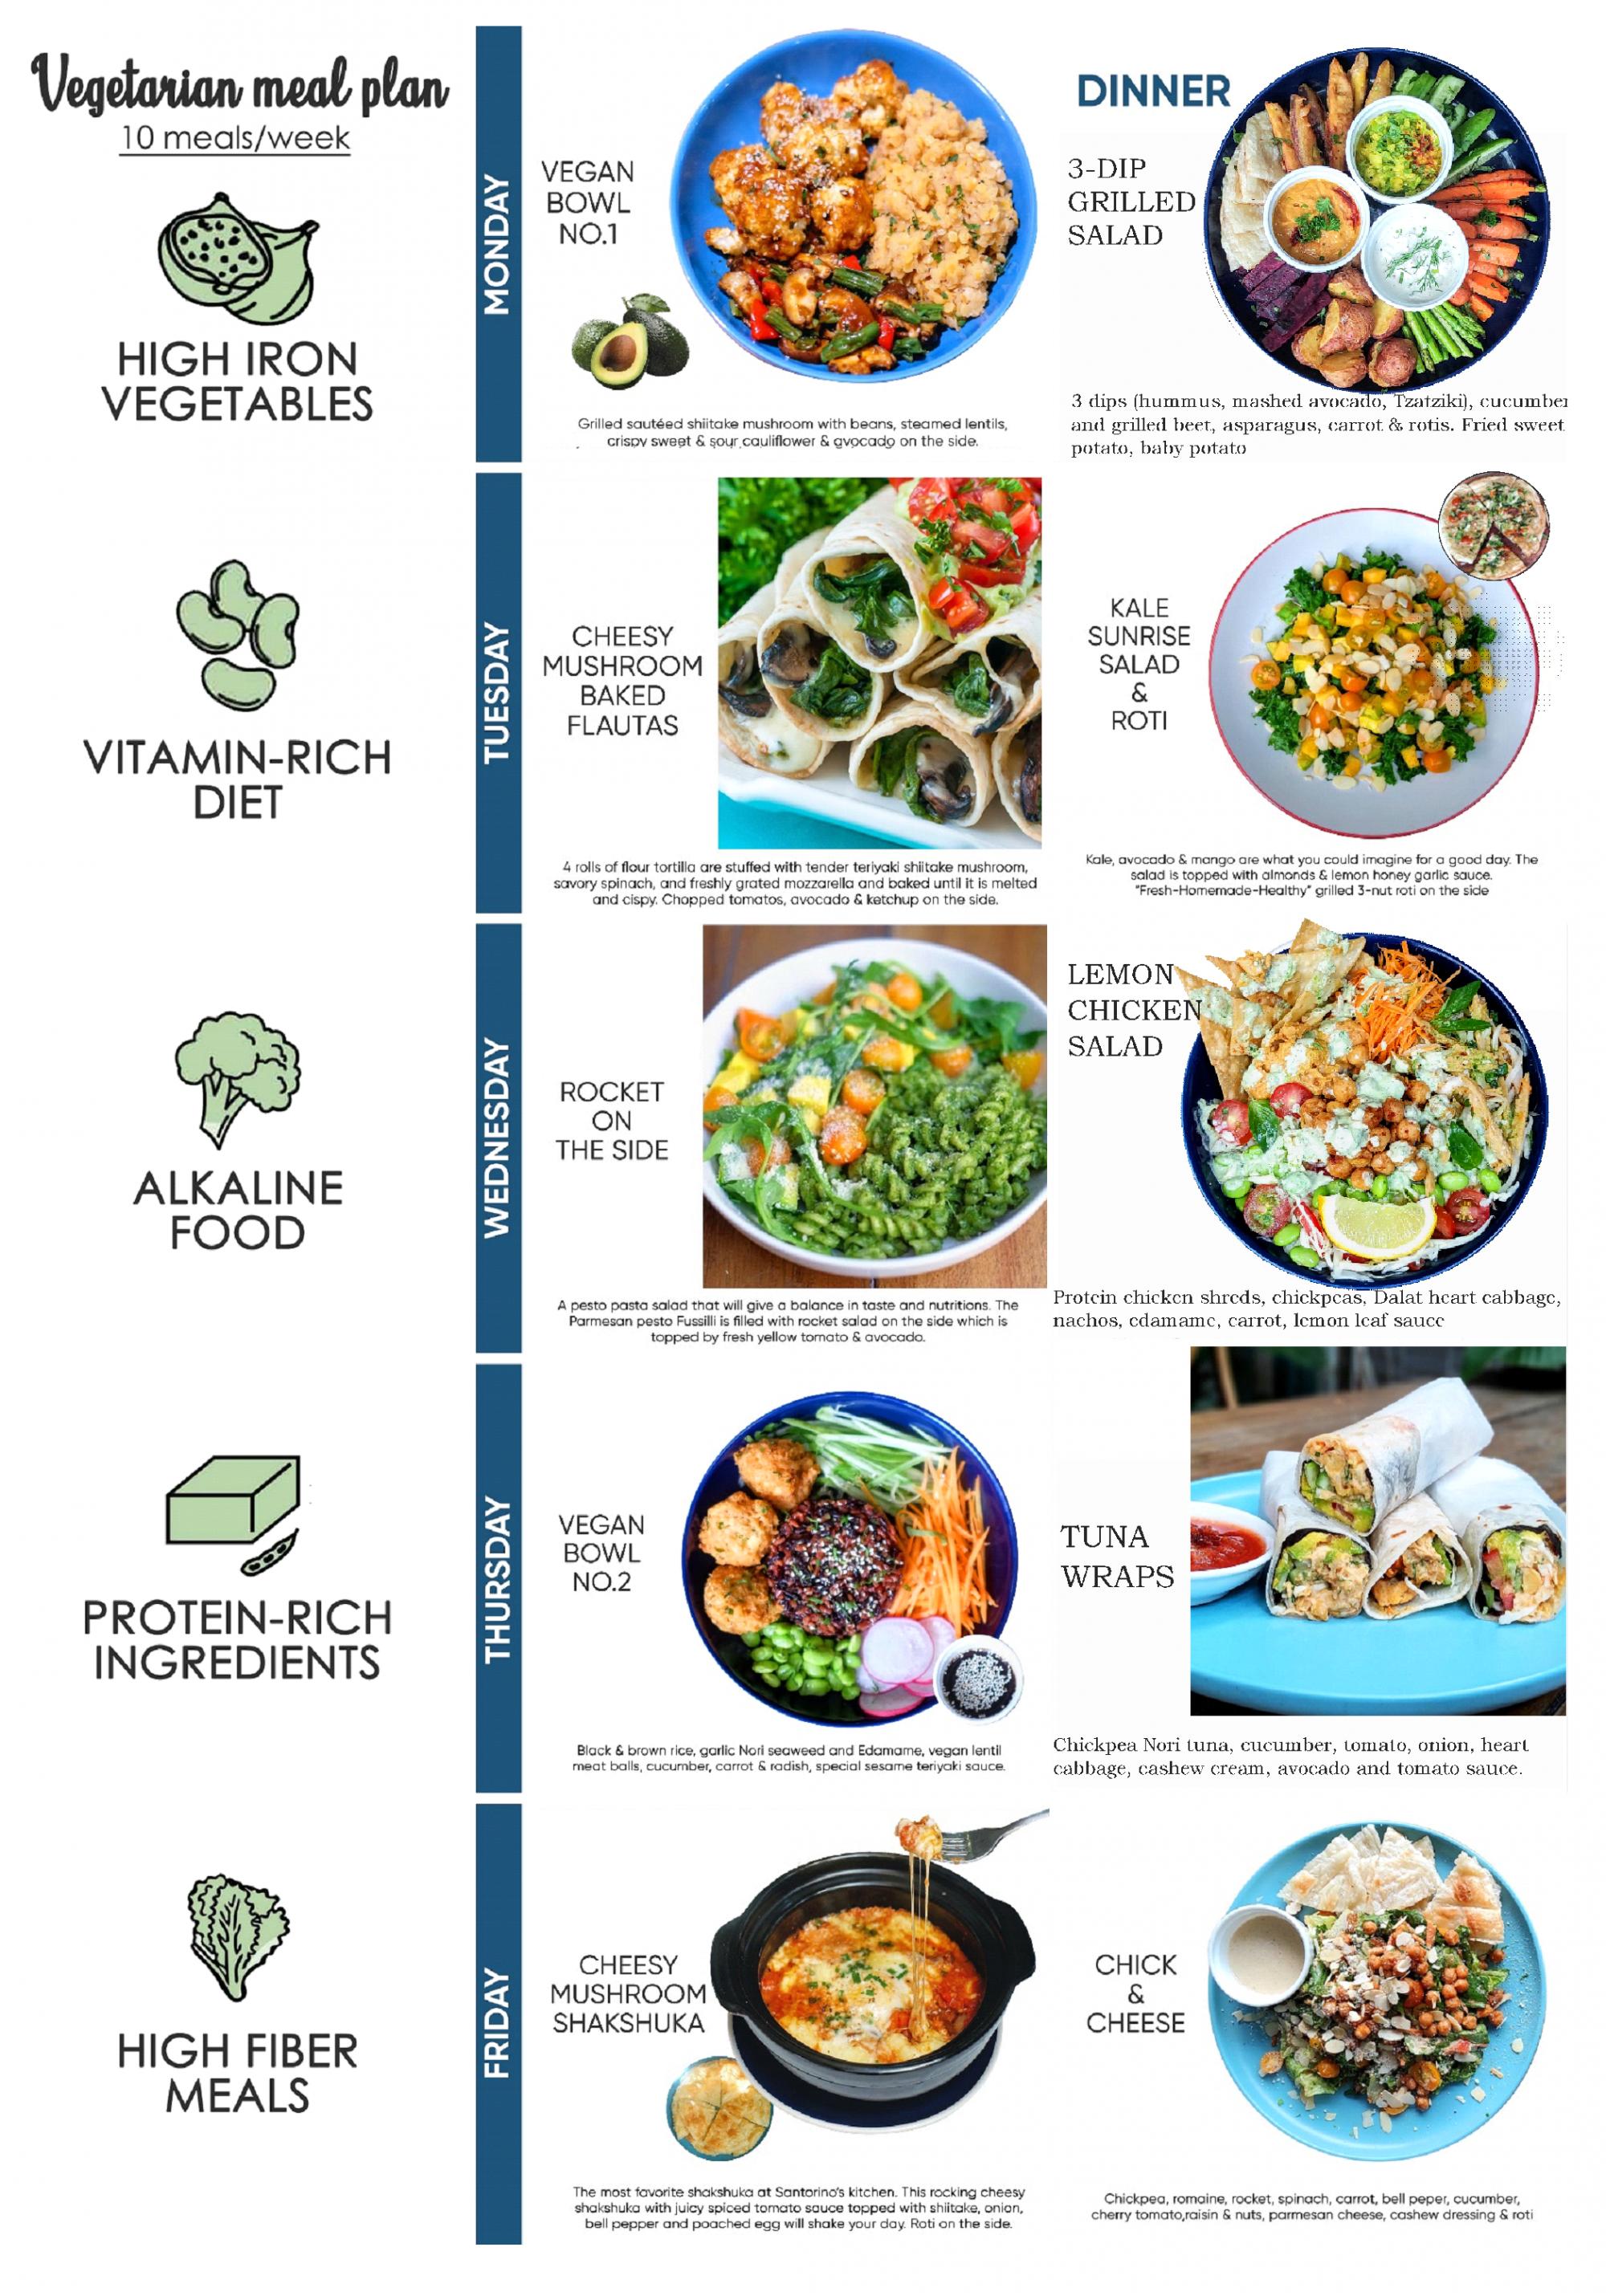 Vegetarian-meal-plan-in-Saigon-Hochiminh-city-by-Santorino-WEEK-8